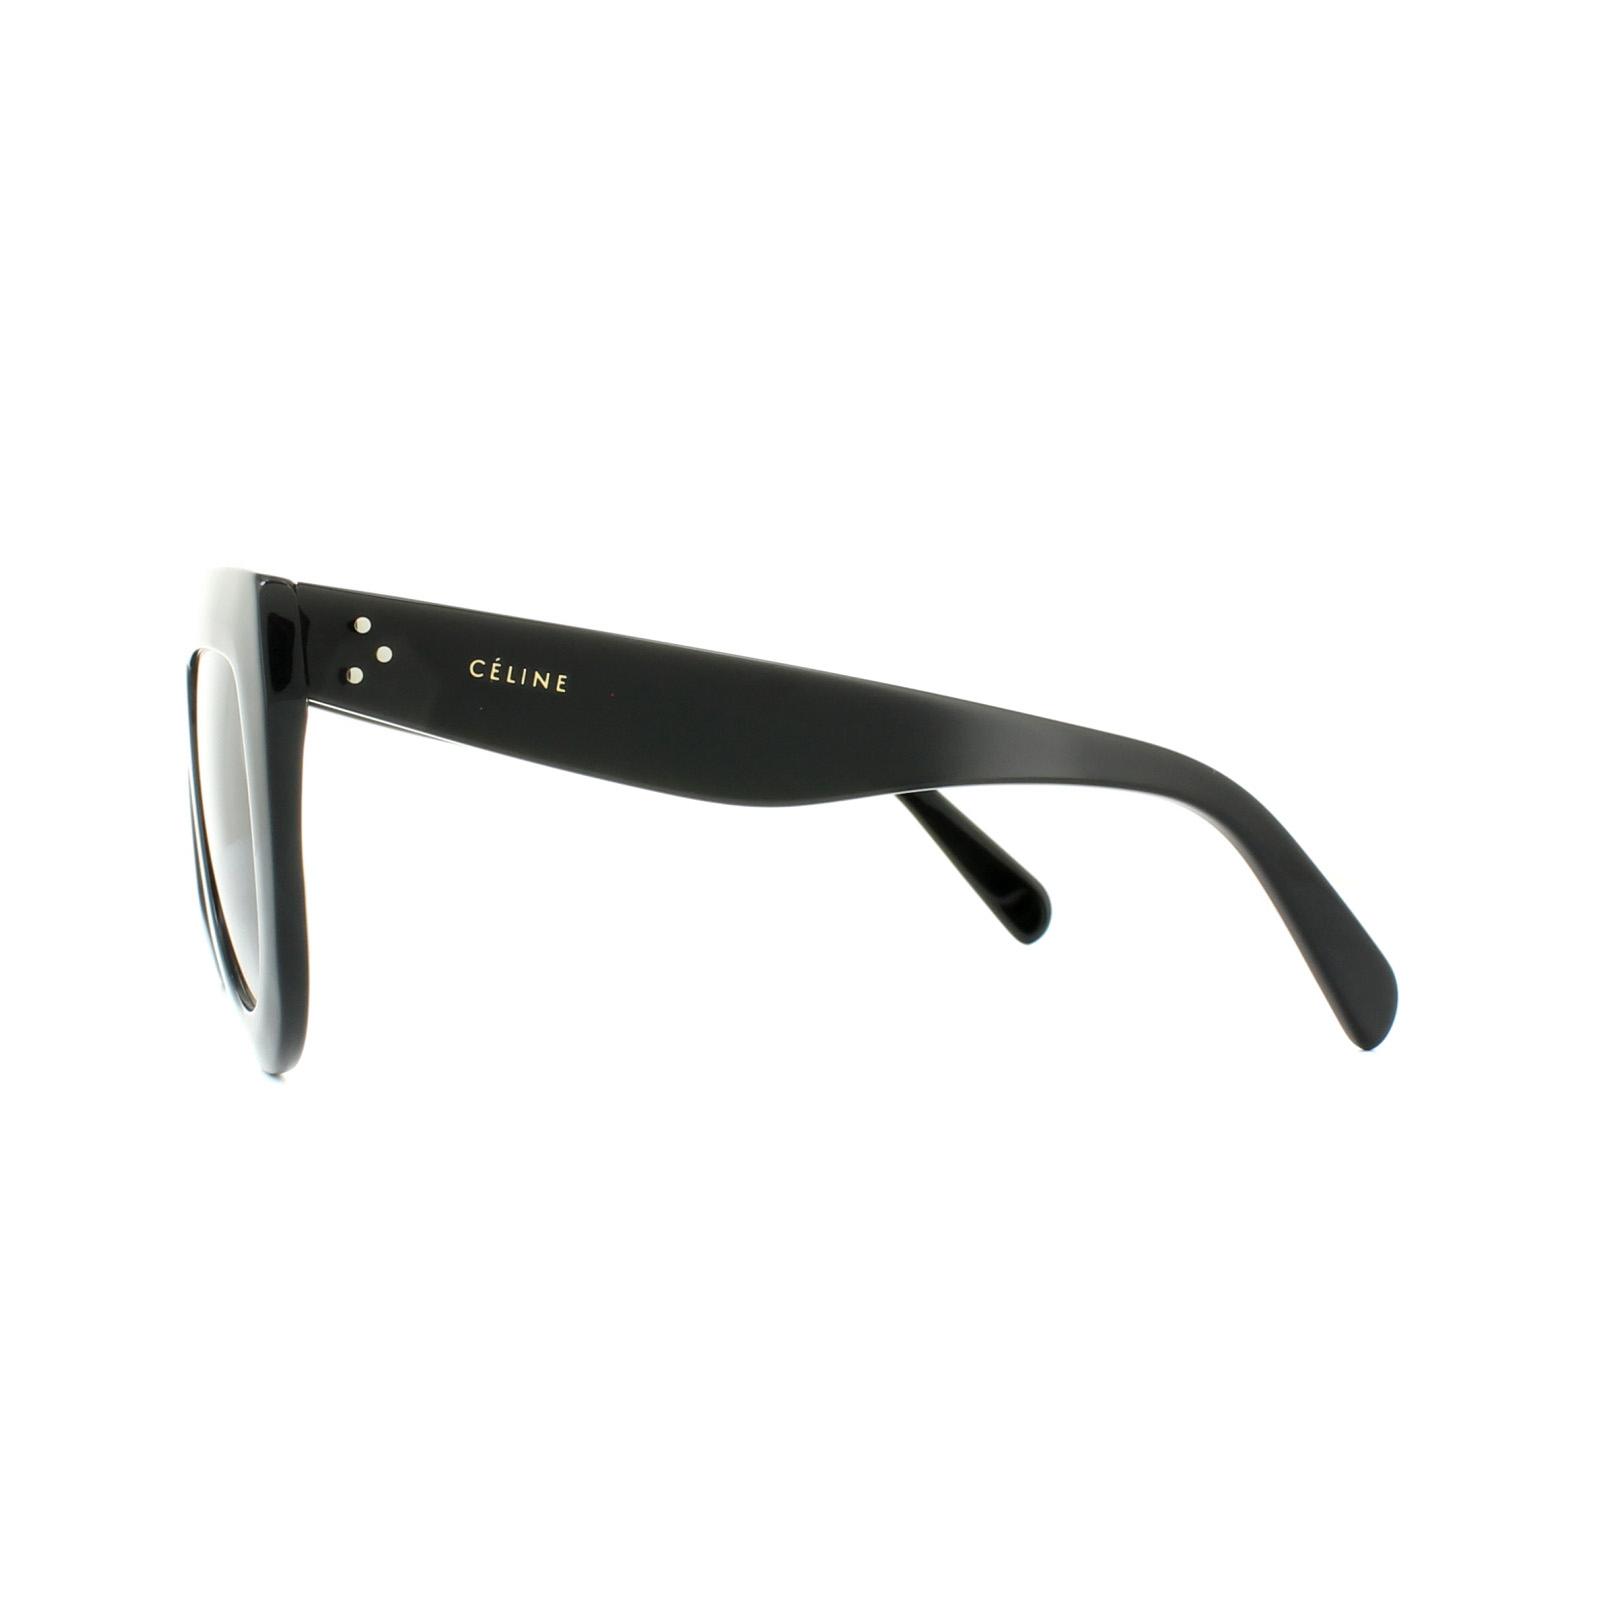 9cf3a0ee4058b Cheap Celine 41398 S Andrea Sunglasses Discounted Sunglasses